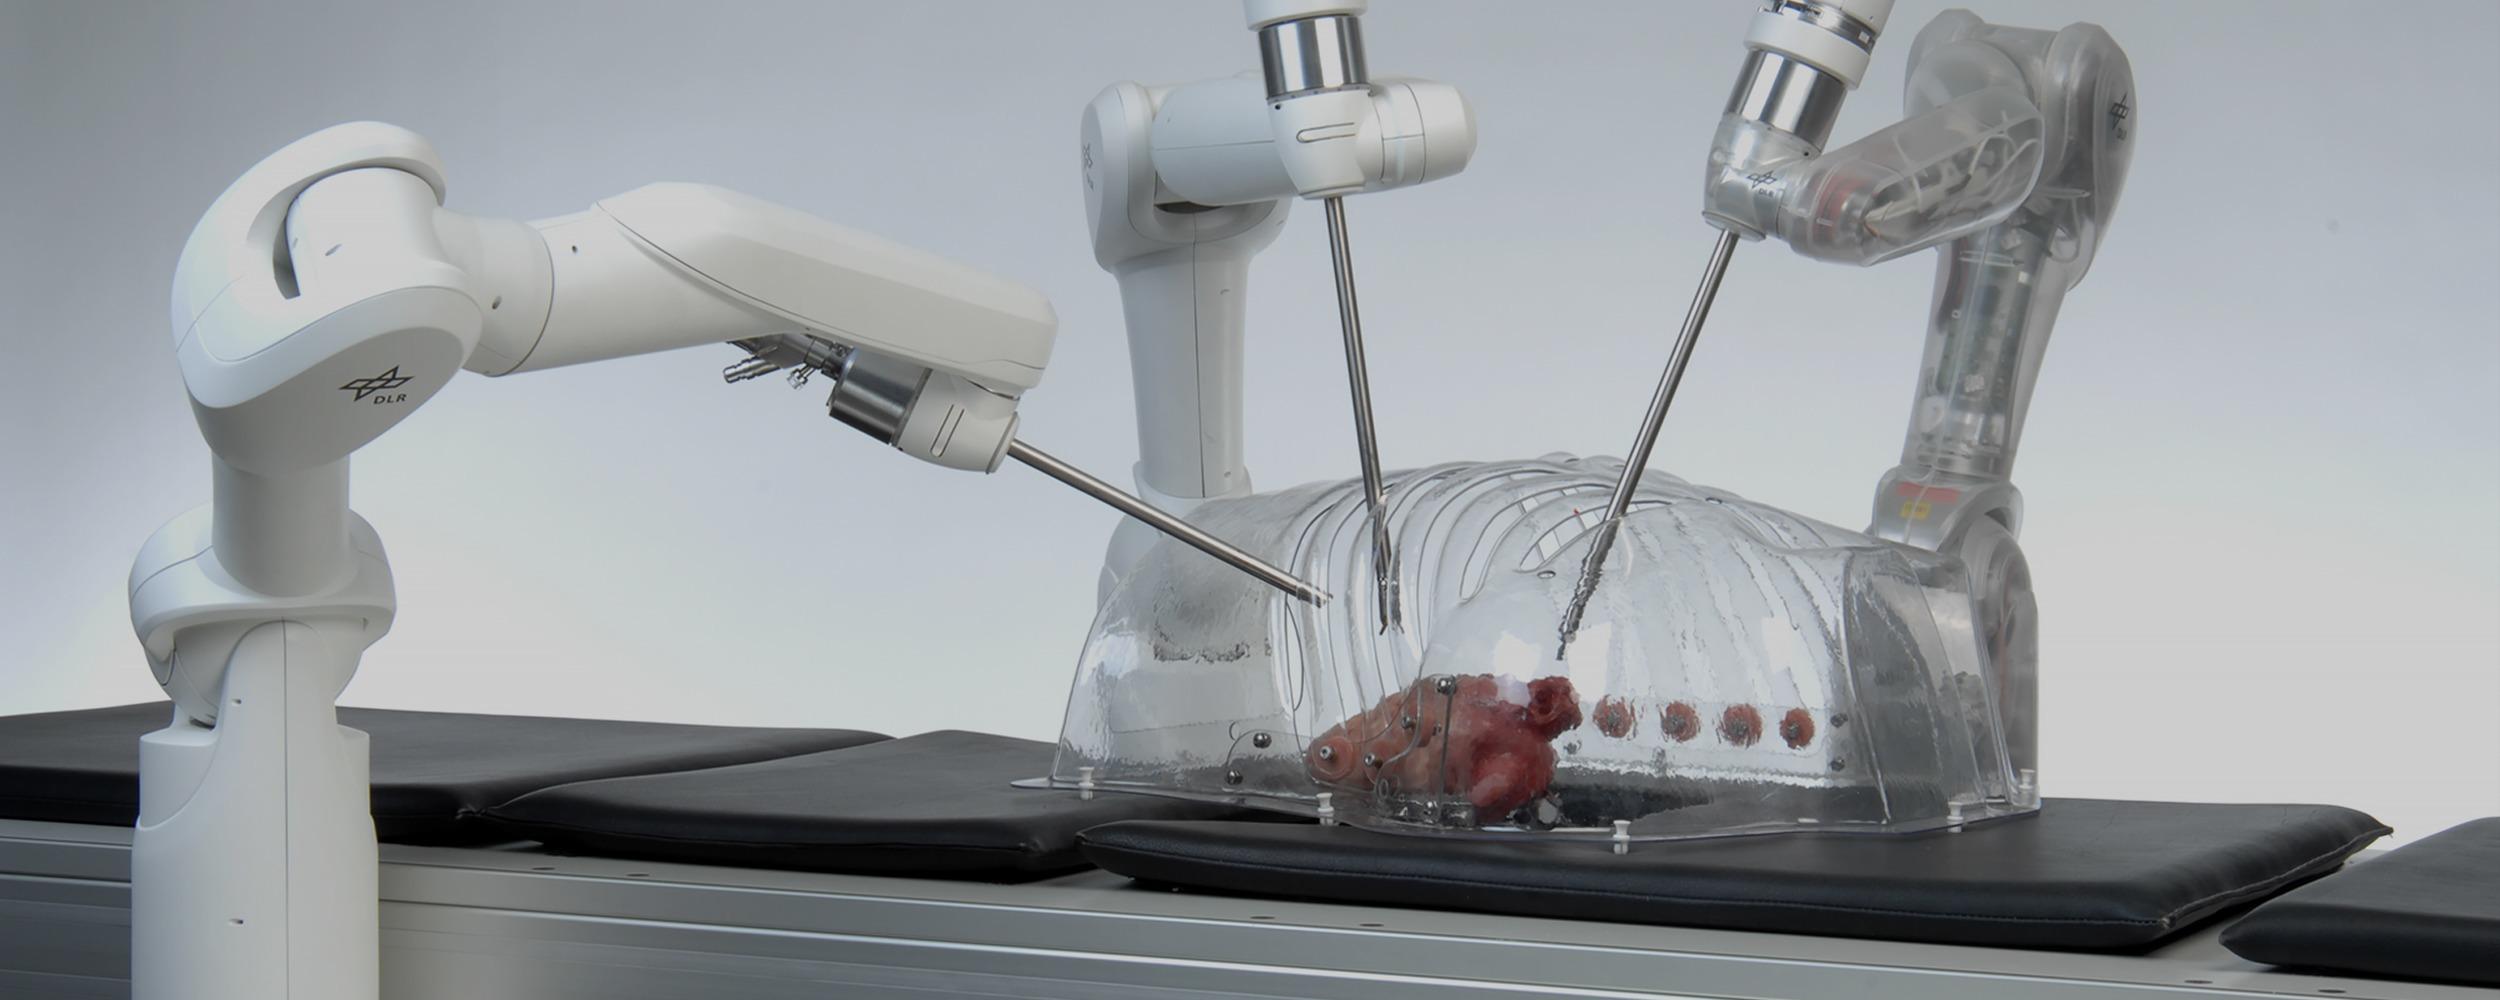 Should we trust robotic surgery?